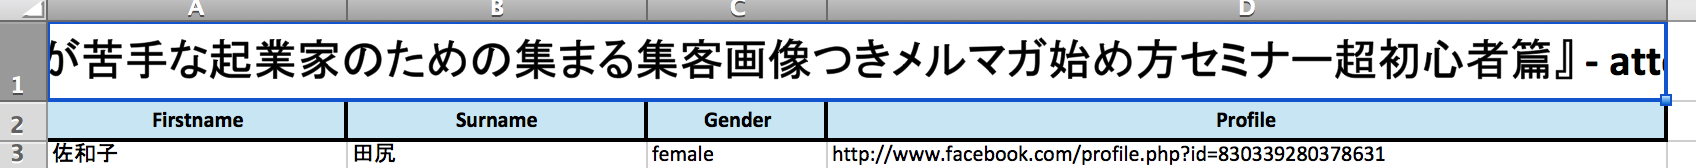 https://www.agentmail.jp/image/?i=WVlfKiKMKWM%3D